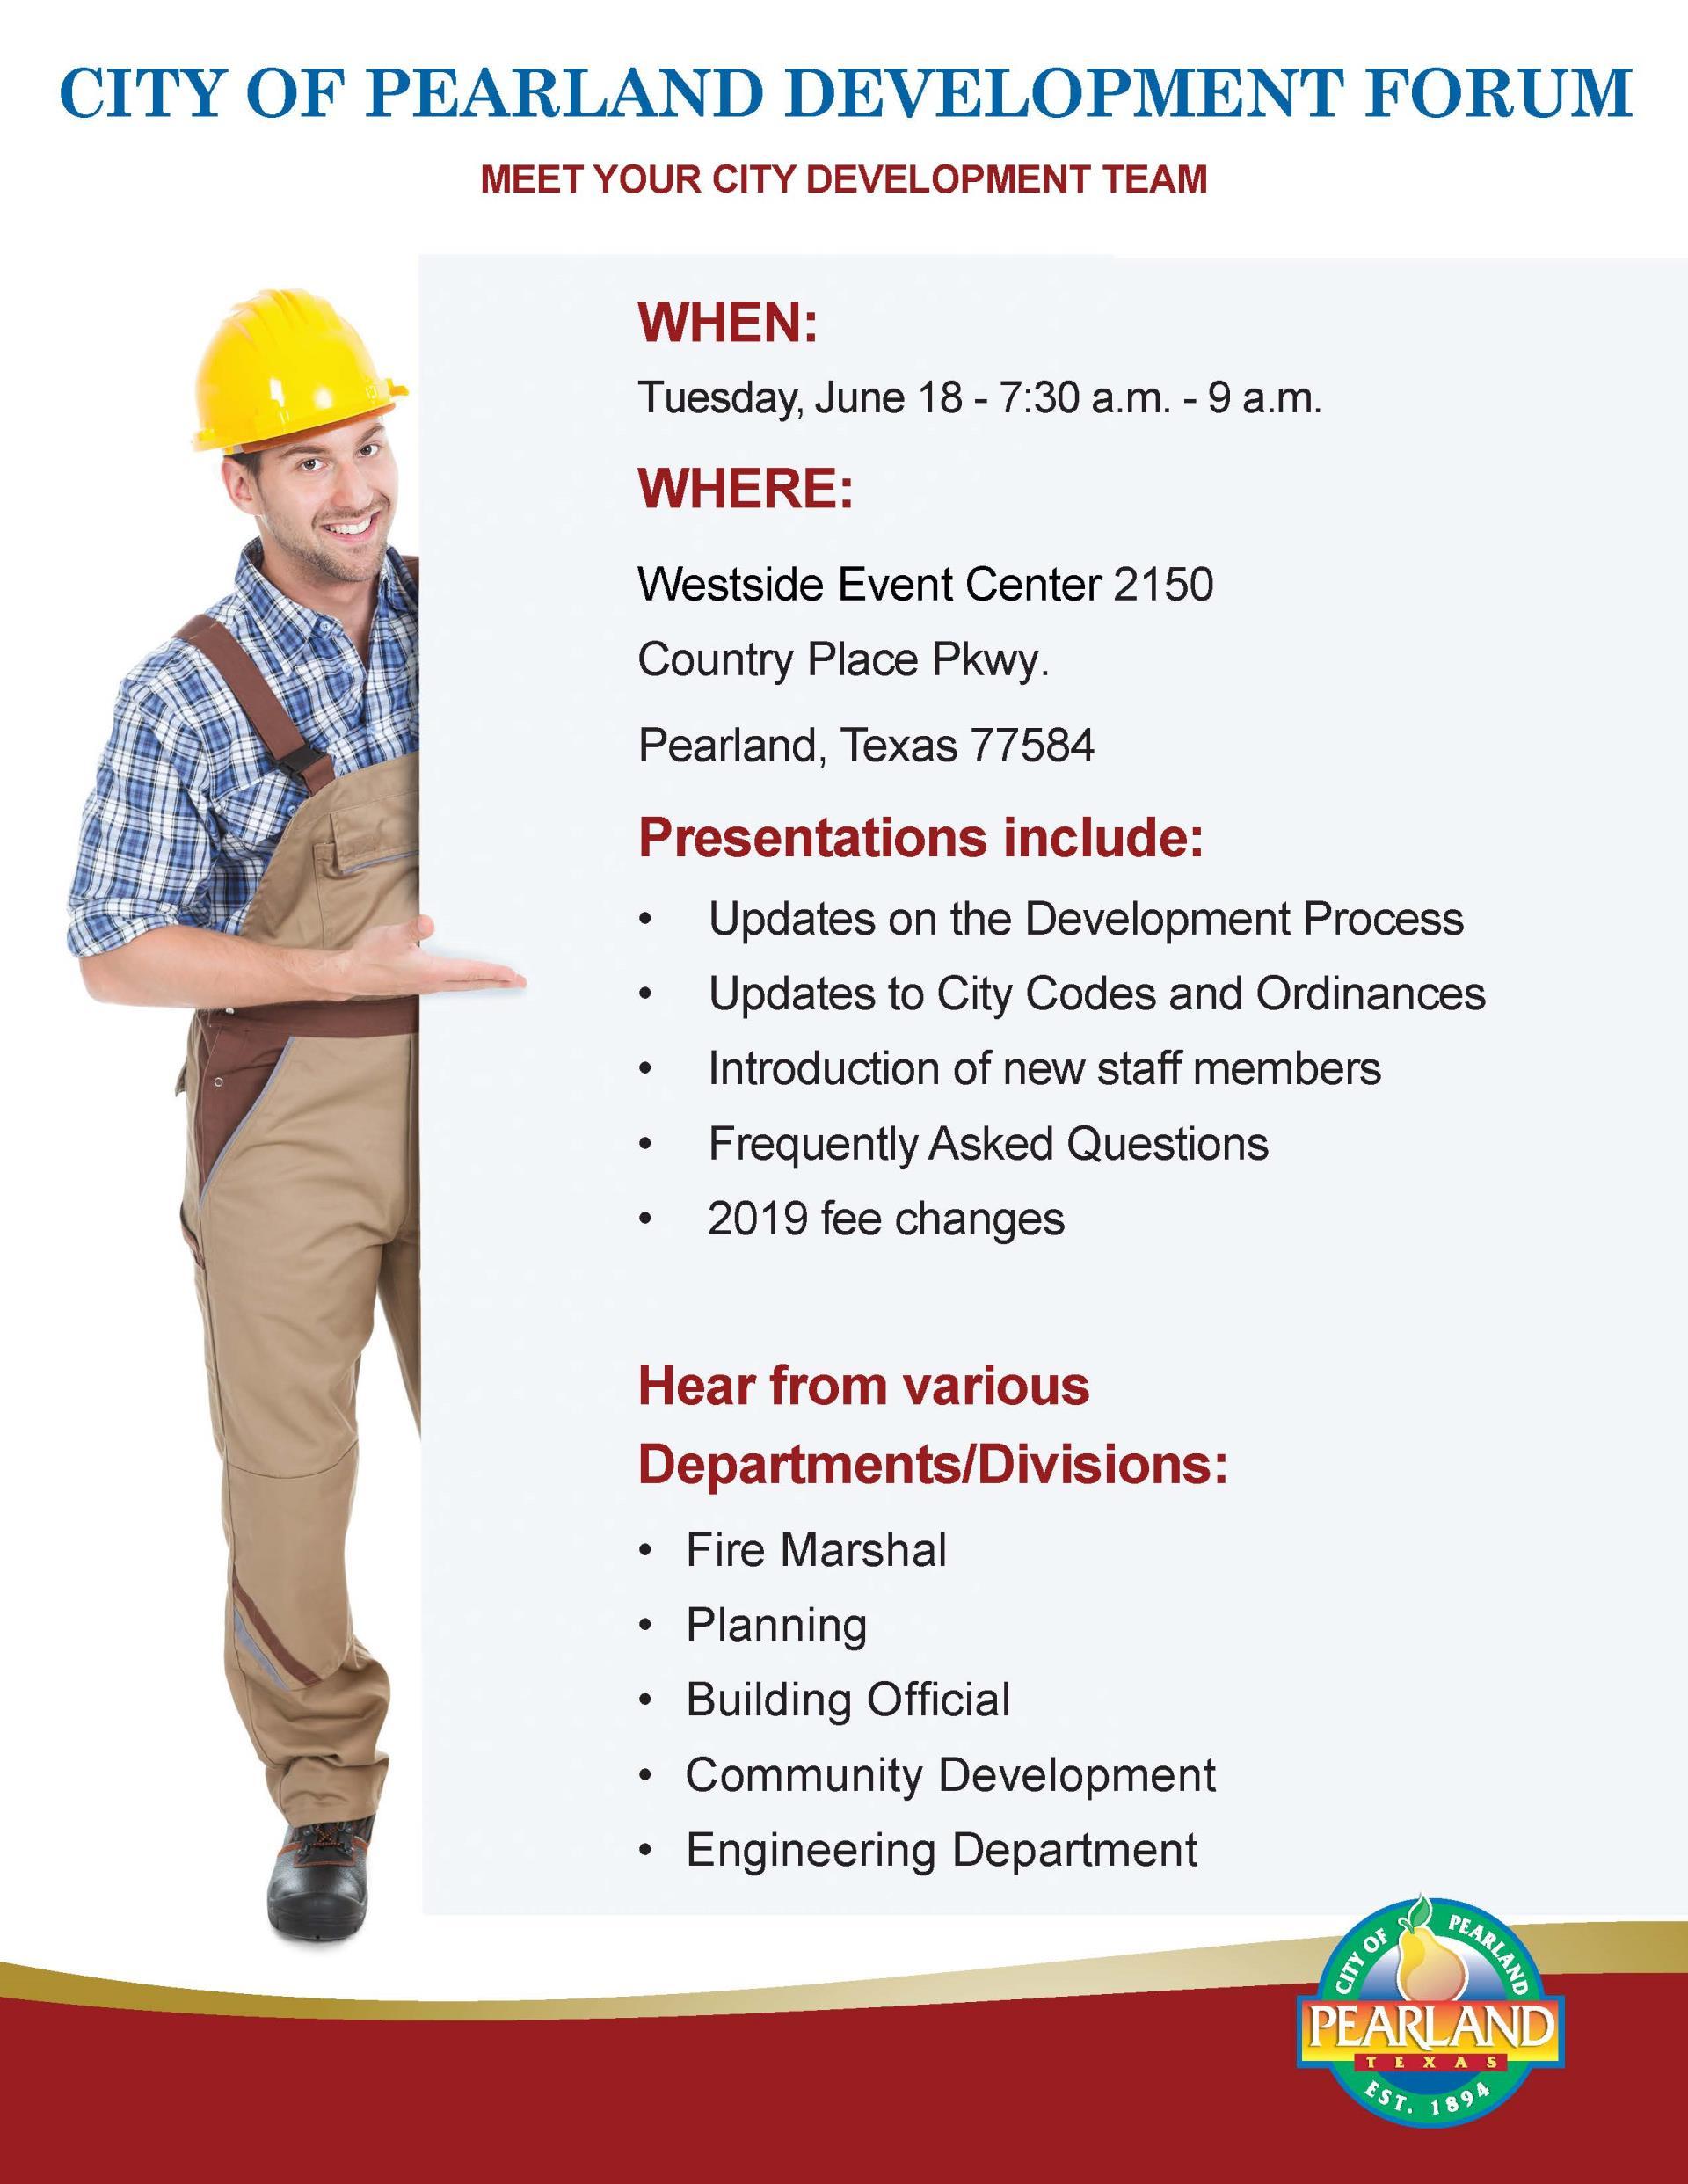 City of Pearland Development Forum | Calendar Meeting List | City of